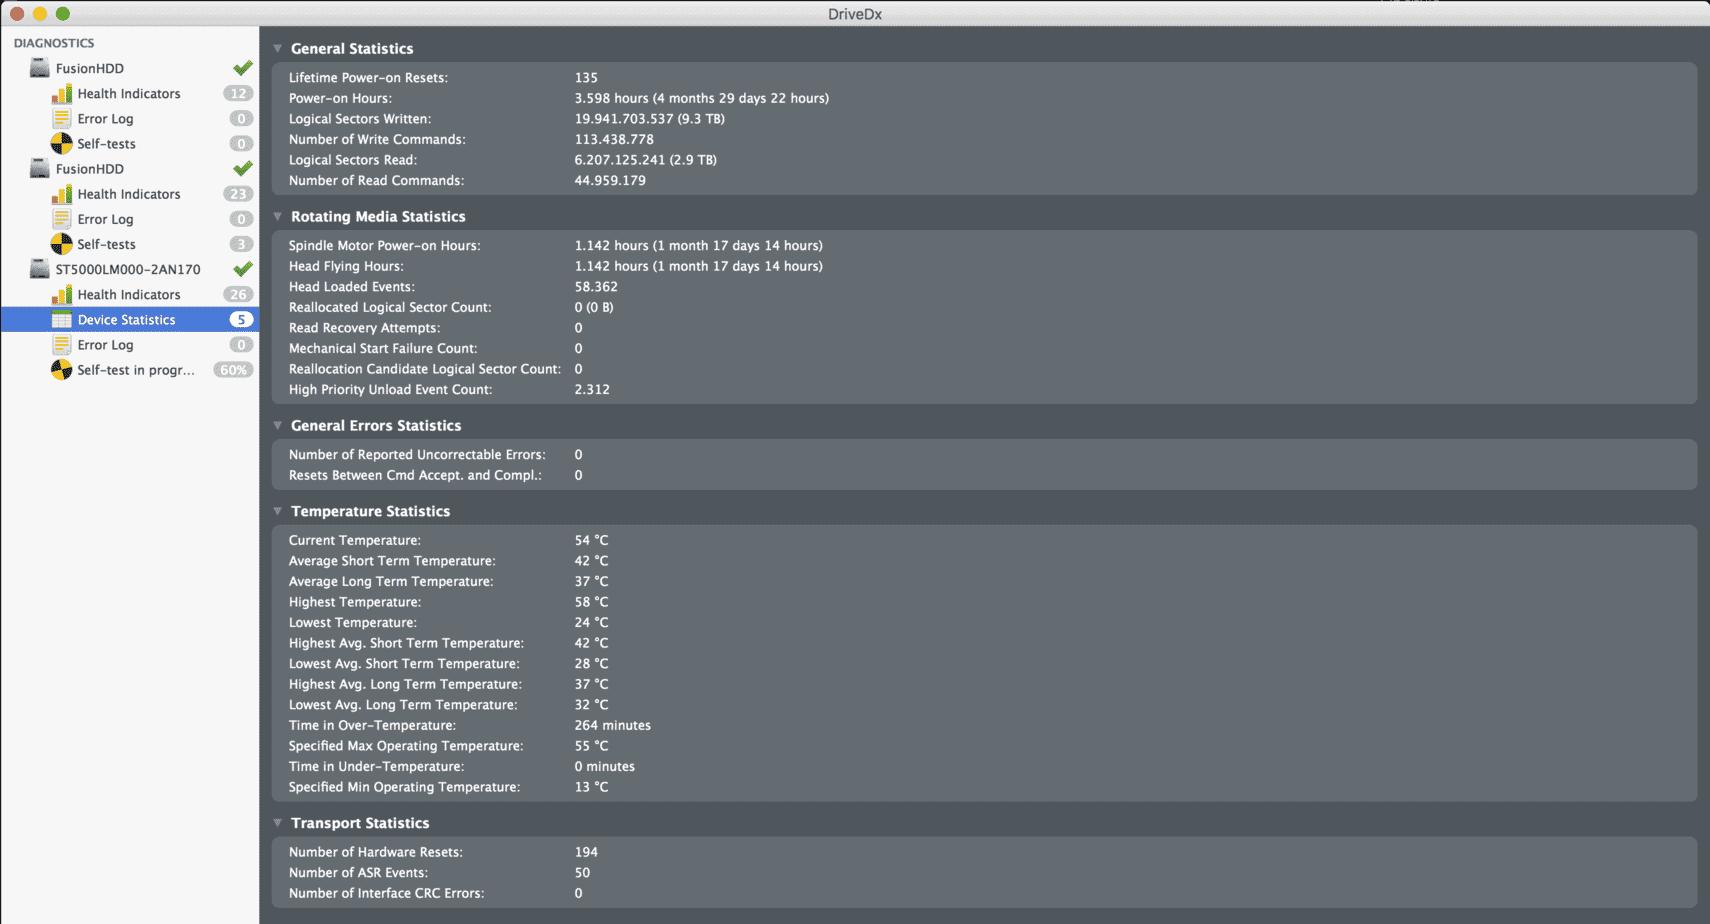 Device Statistics en DriveDX